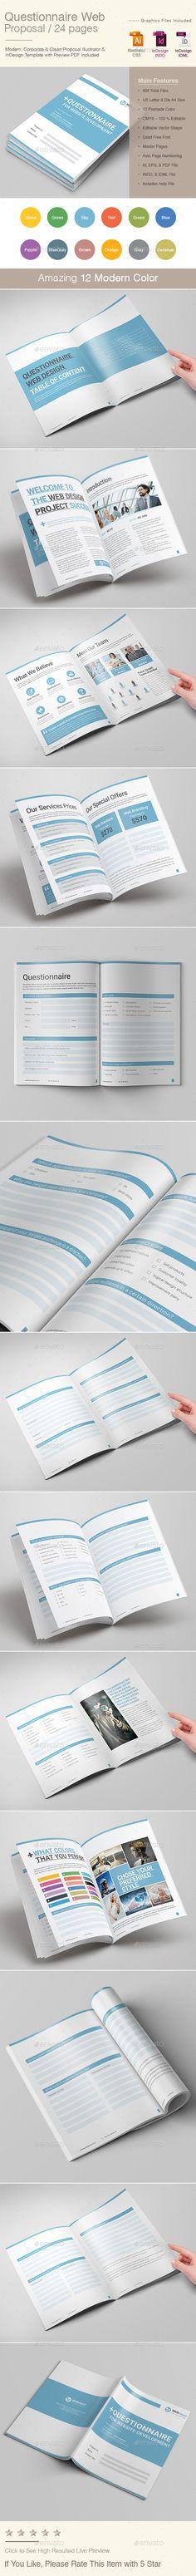 Web Design Proposal Proposals, Design and Templates - service quotation